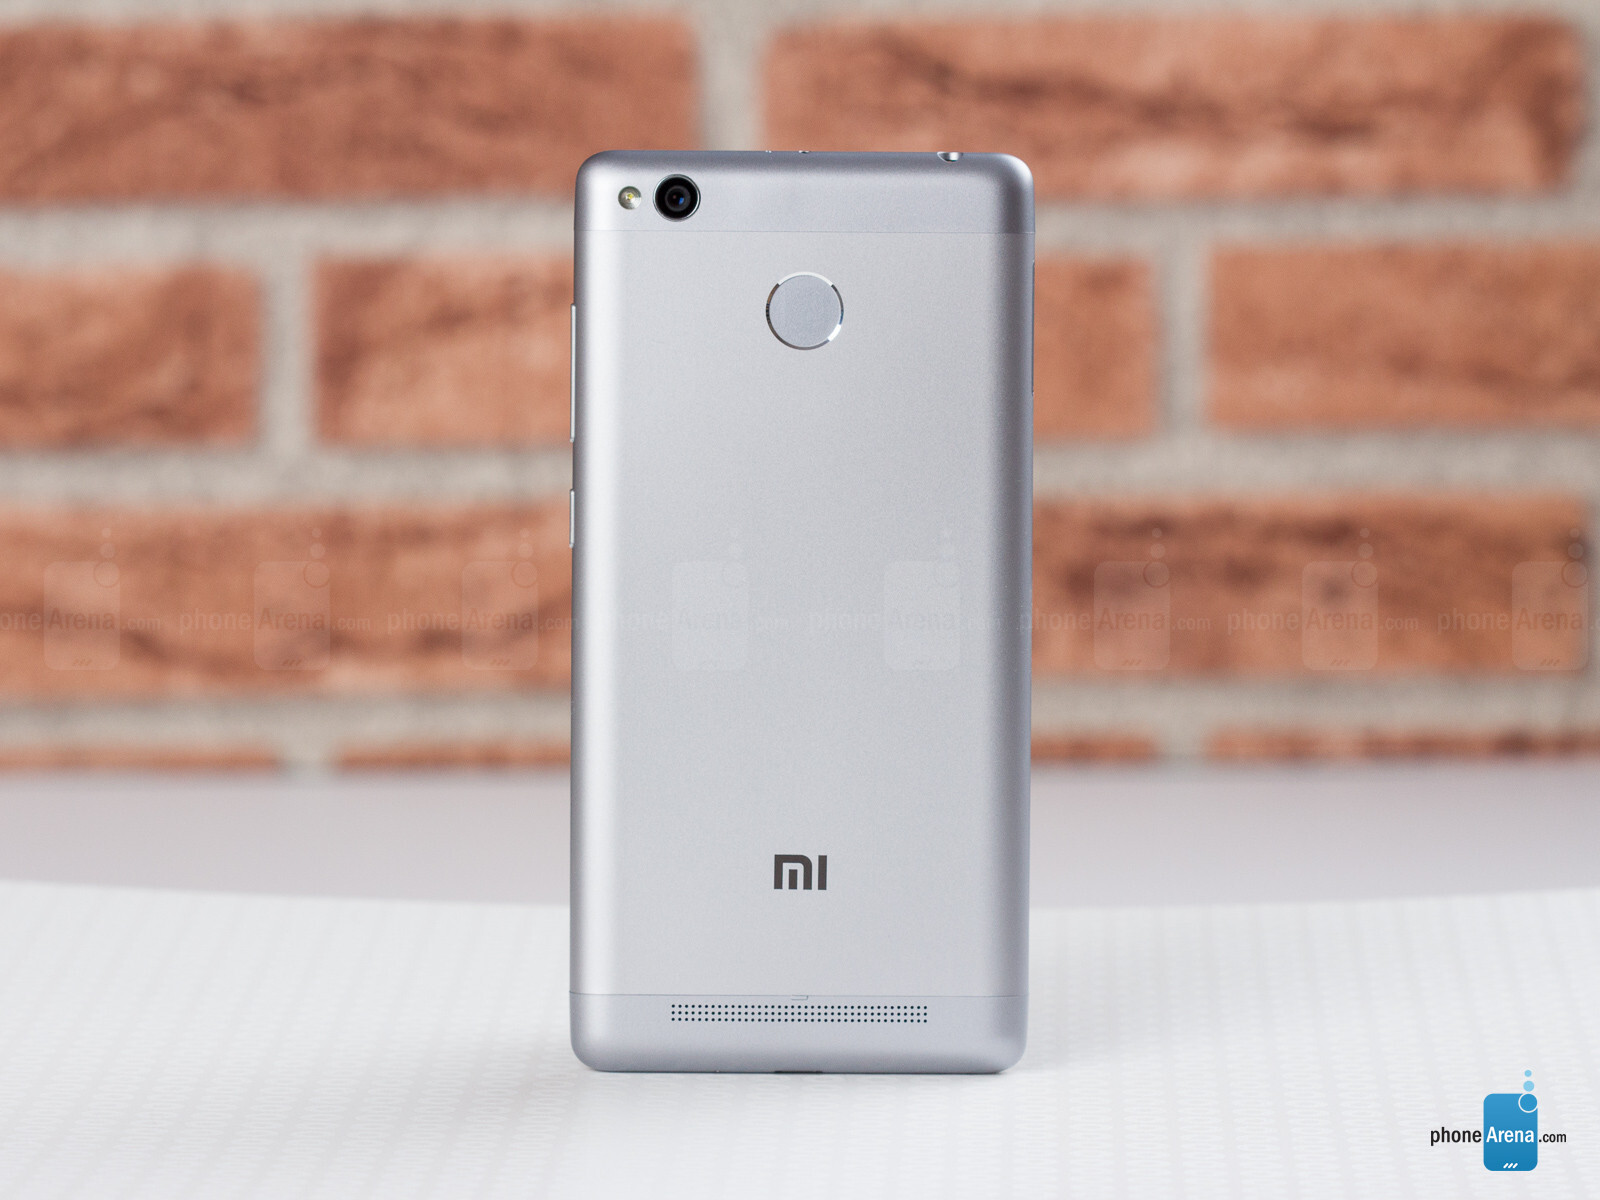 Xiaomi Redmi 3s Review